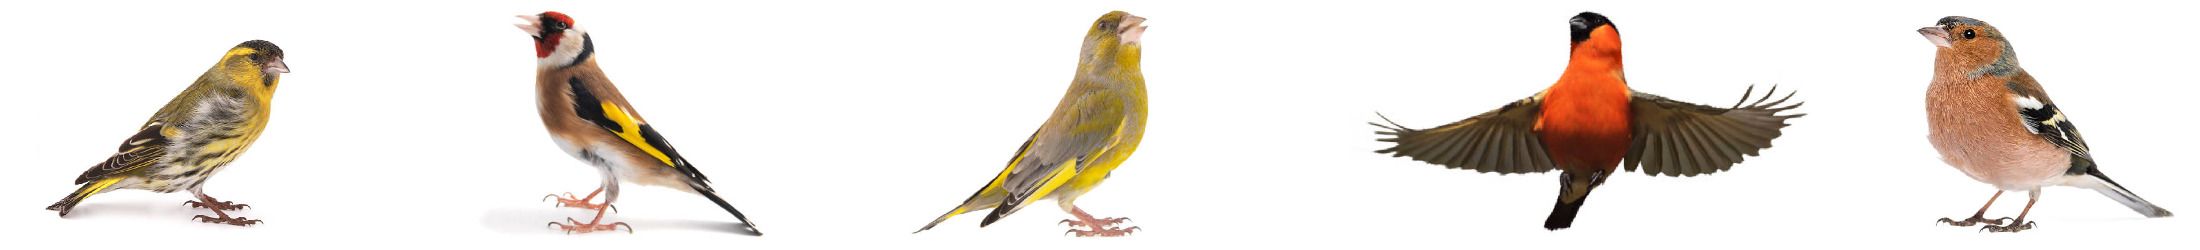 Wildzang vogels bodempapier